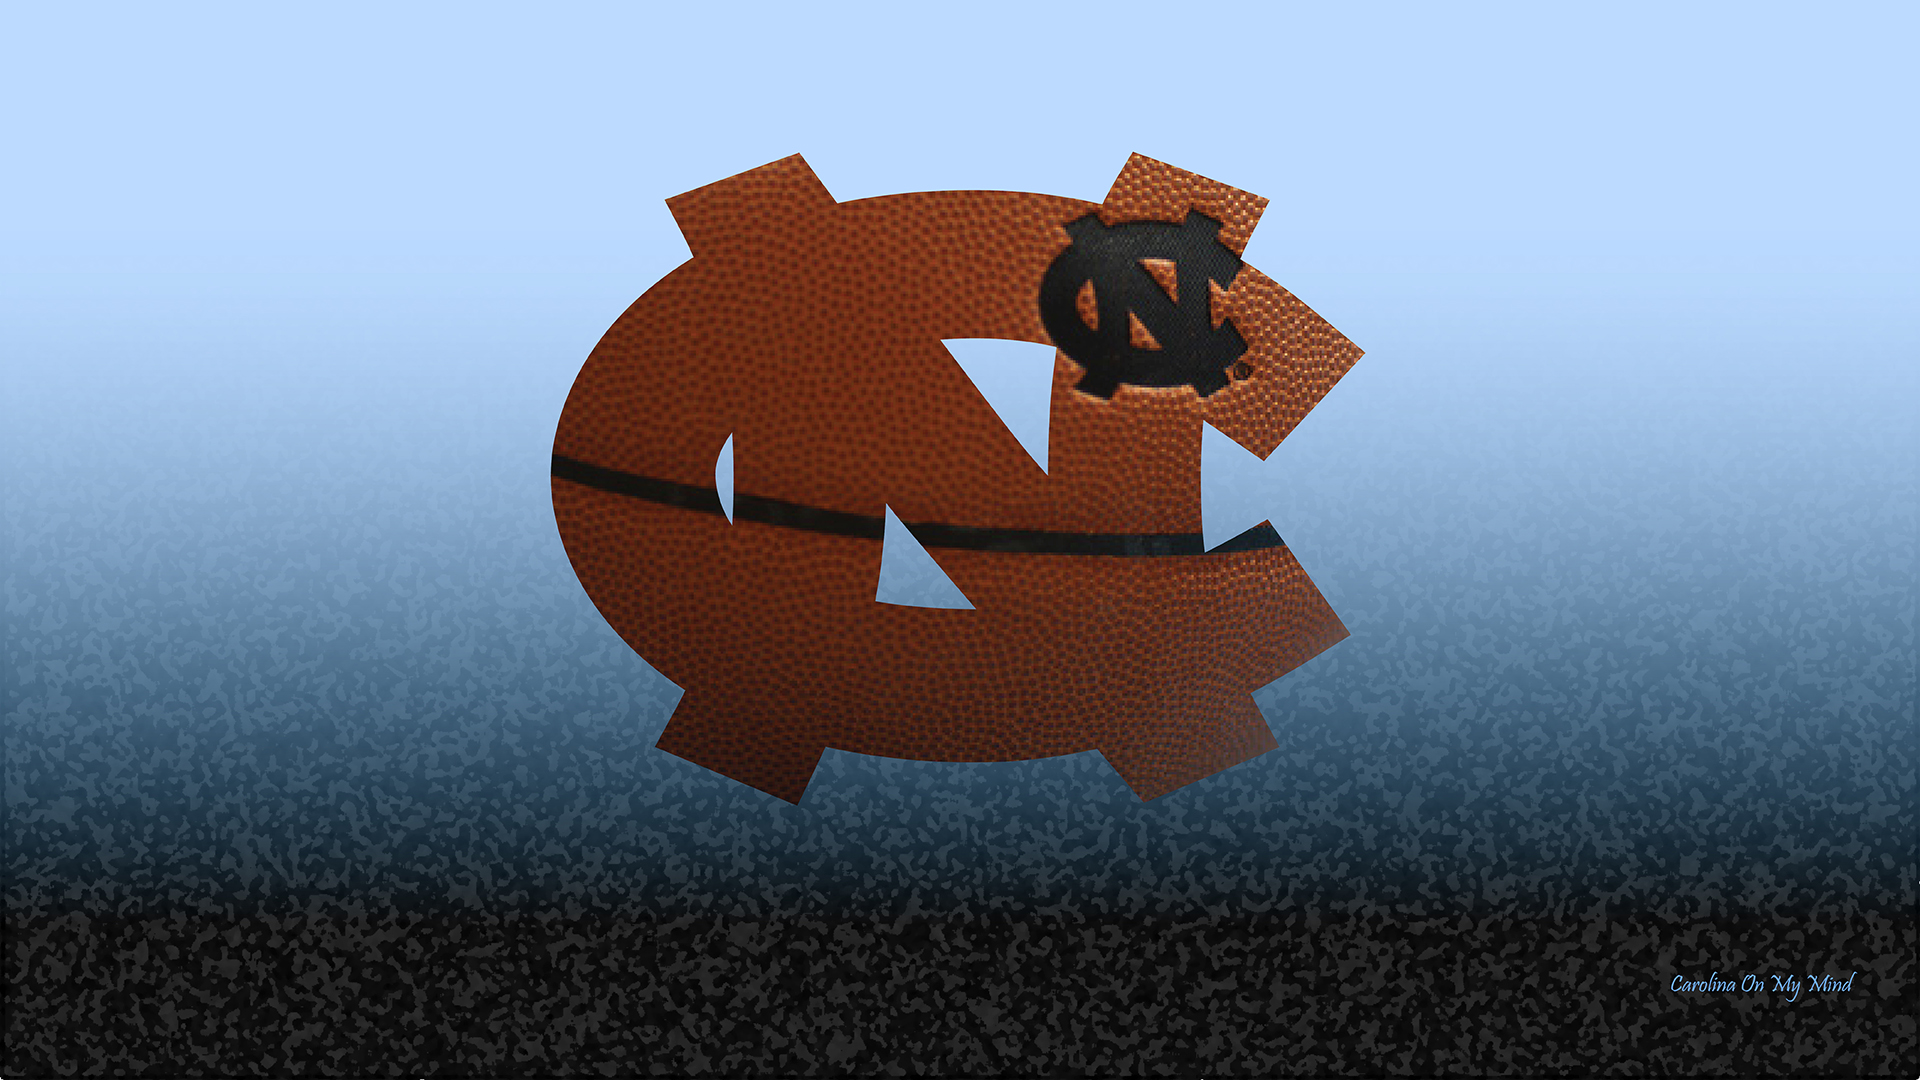 UNC Wallpaper   Basketball Grain NC Logo on Light Blue and Black 1920x1080